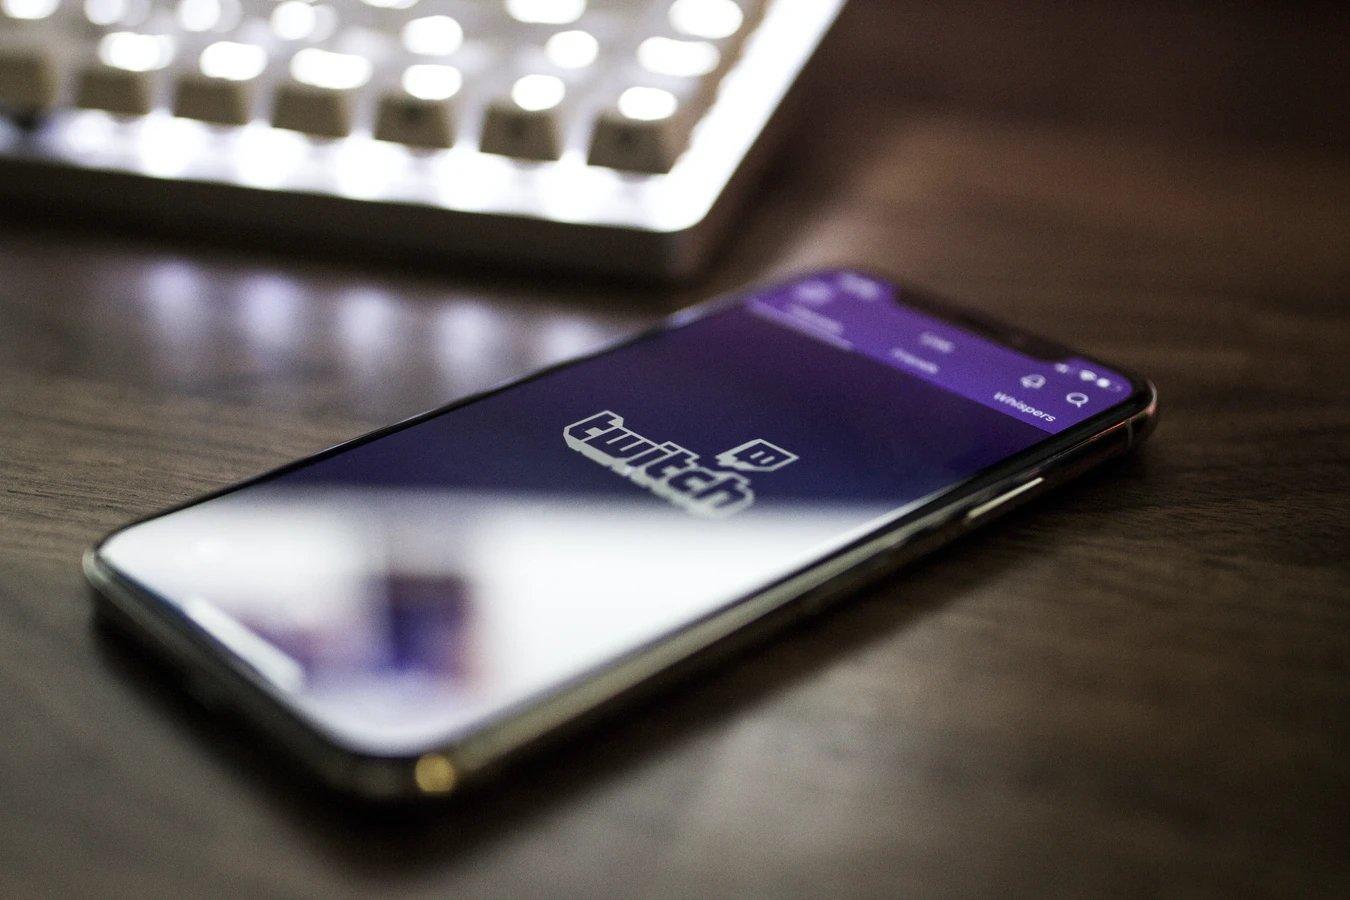 Twitch app smartphone